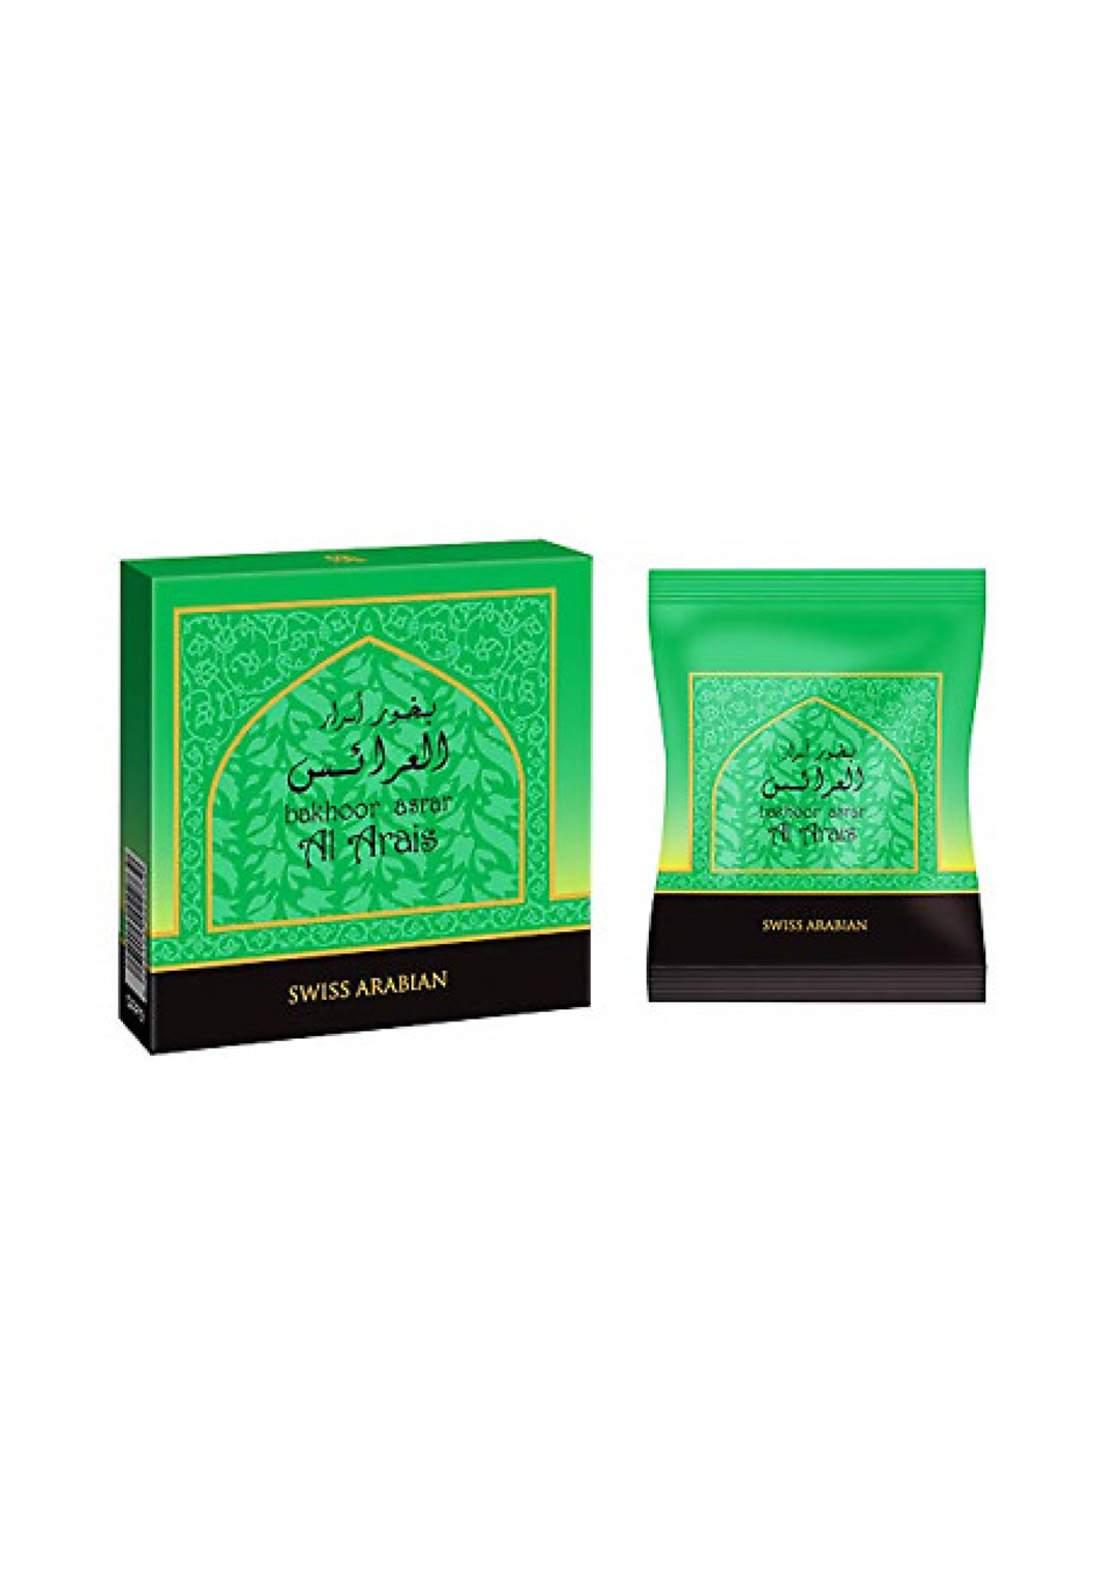 Swiss Arabian 1401 Asrar Al Arais  Incense 40 Grams بخور